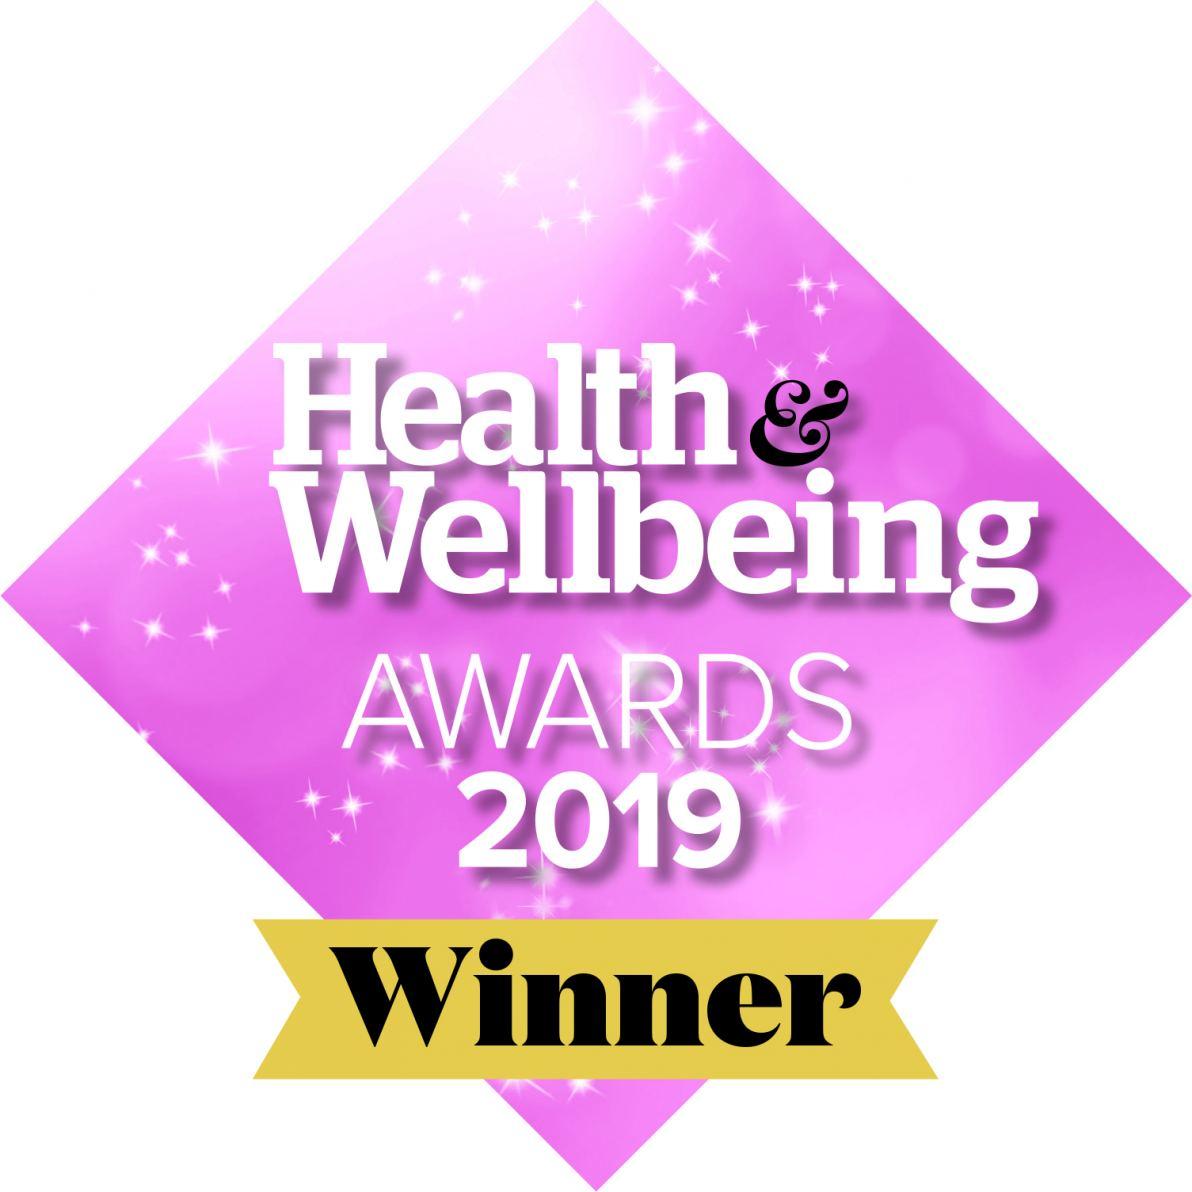 Winner Health & Wellbeing Awards 2019